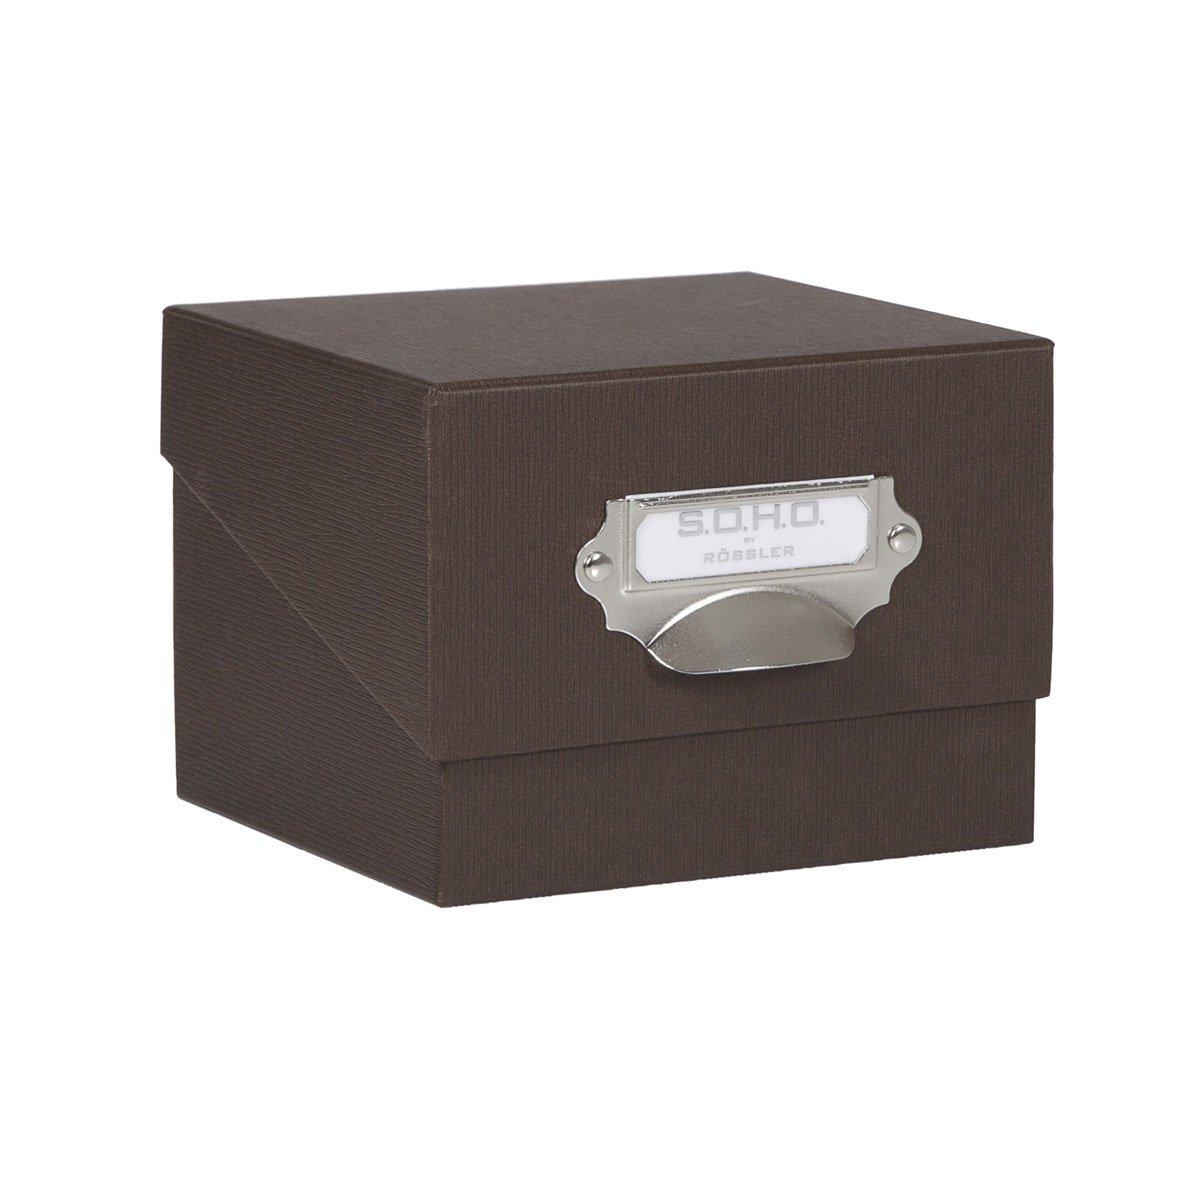 Rössler 1325452700 - Caja de cartón para fotografías, color negro